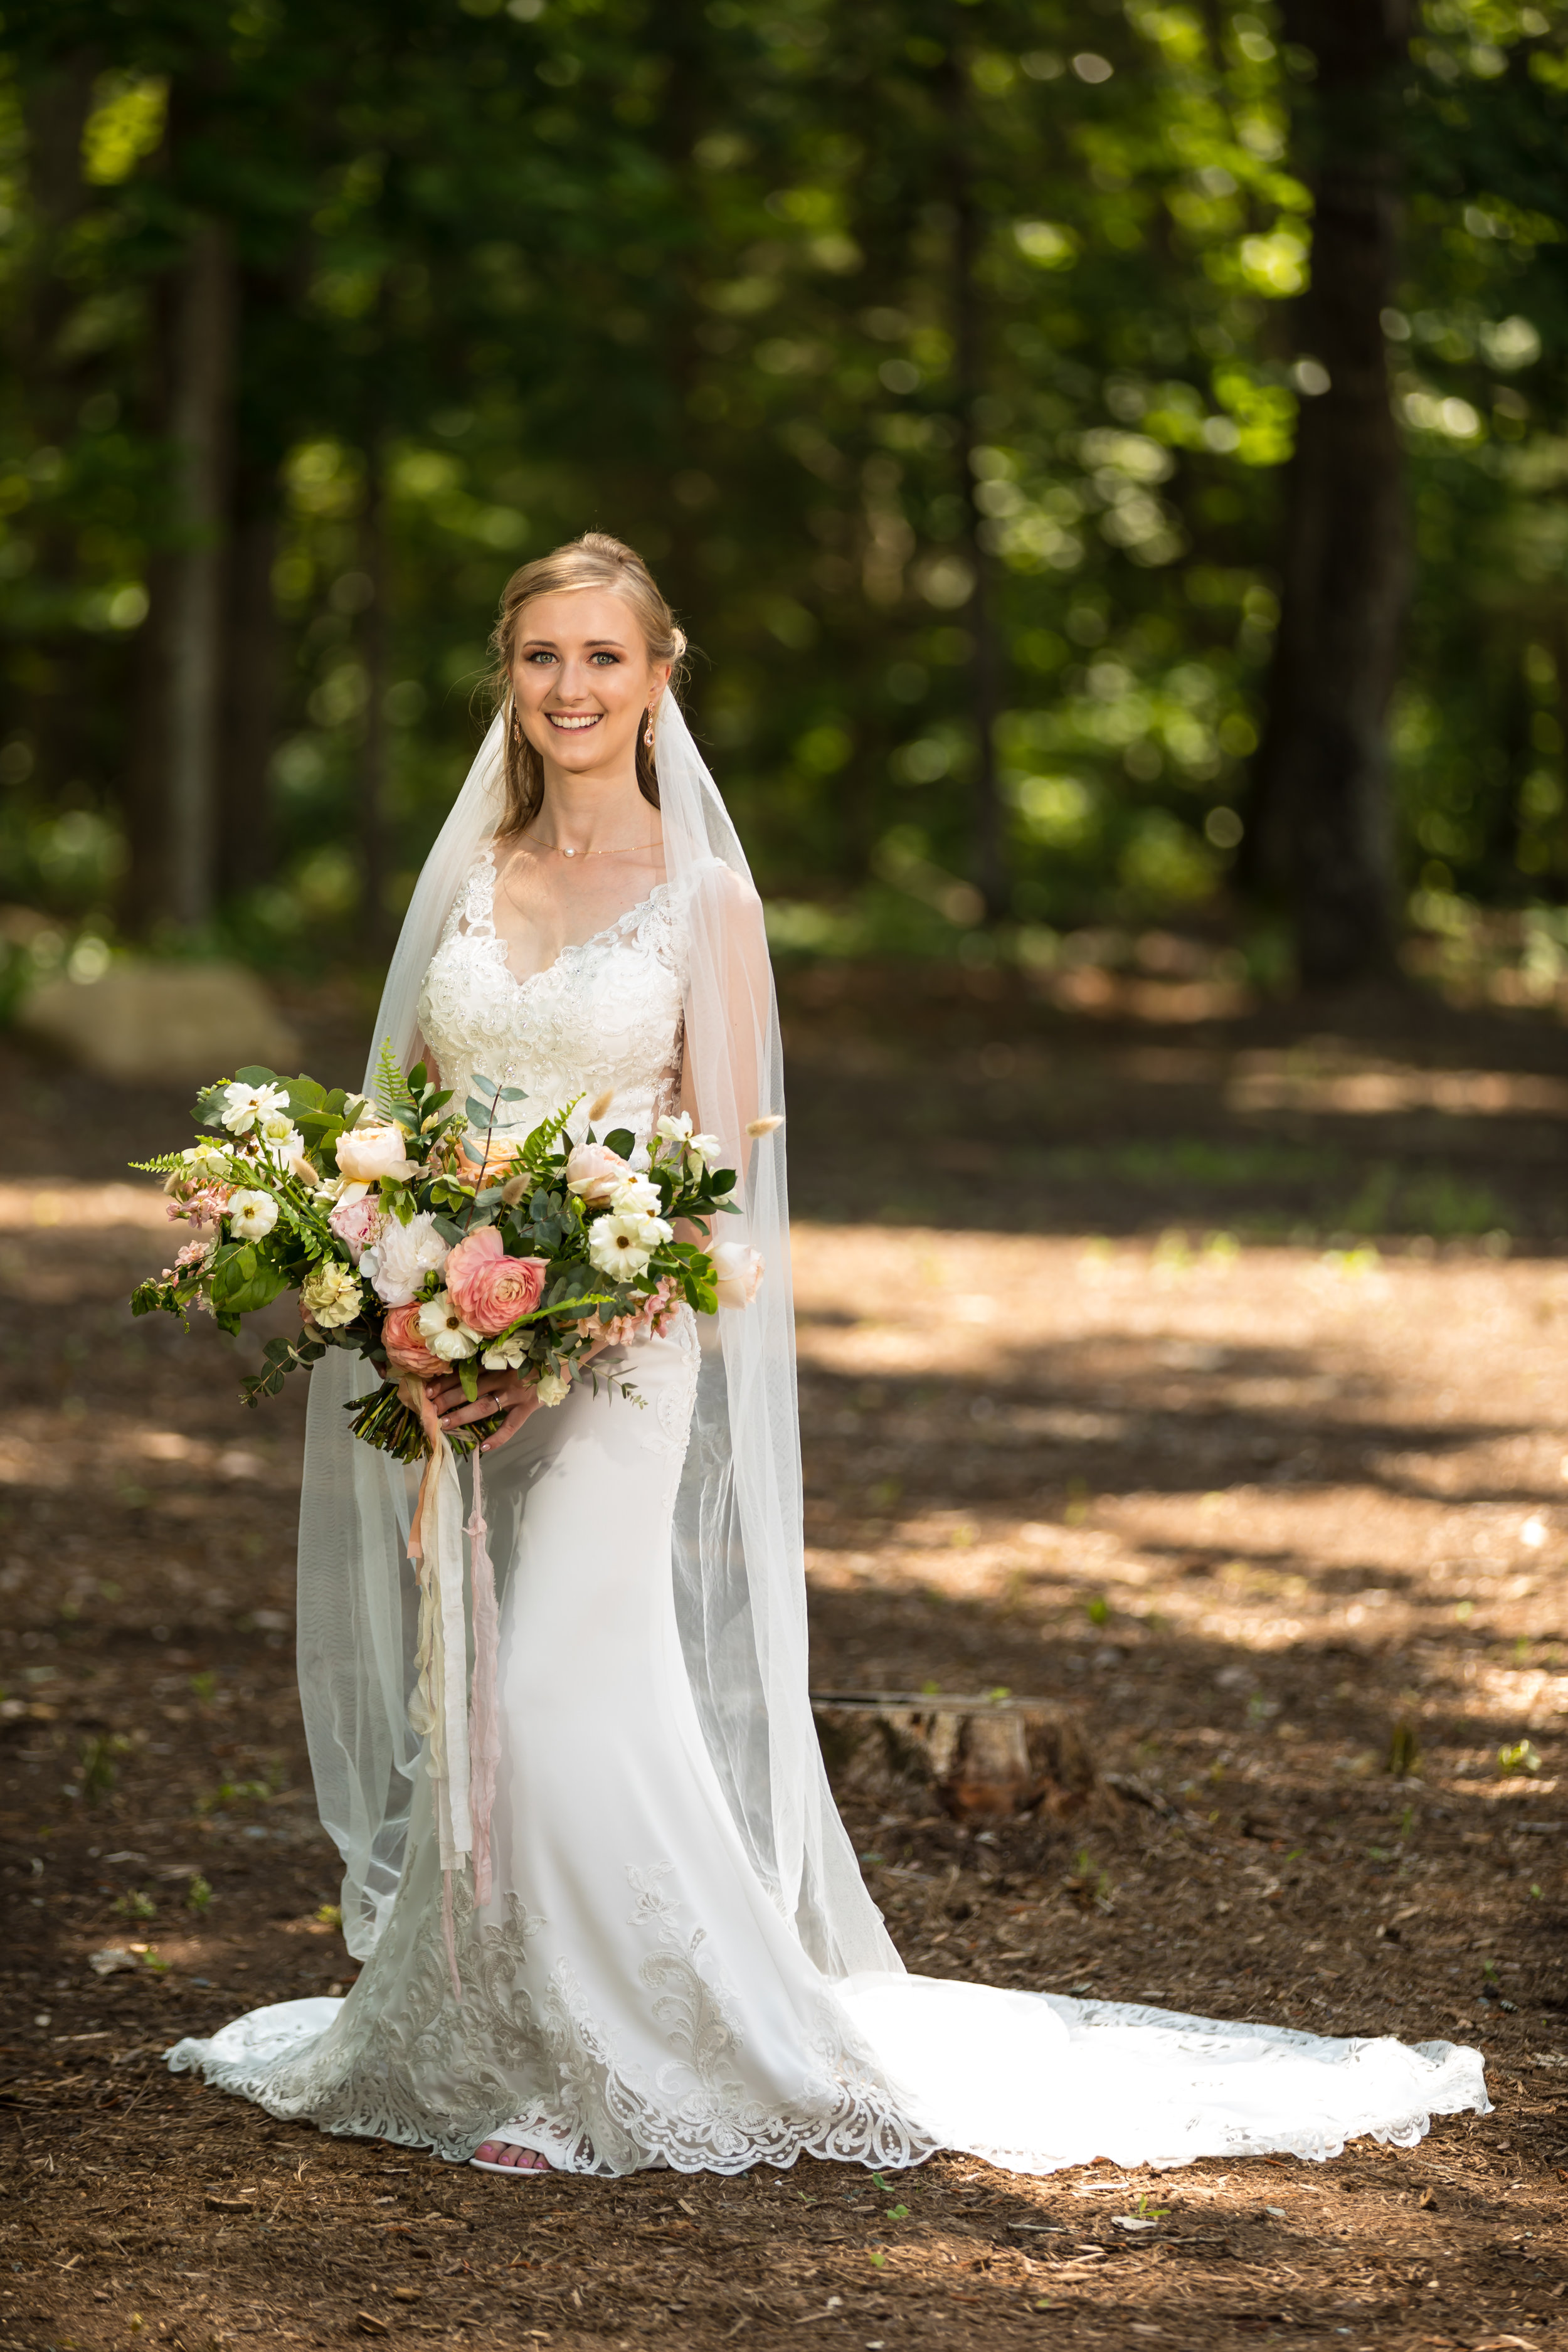 sarah_ikeem_wedding_at_the_parlour_at_manns_chapel_05.18.19-0257.jpg